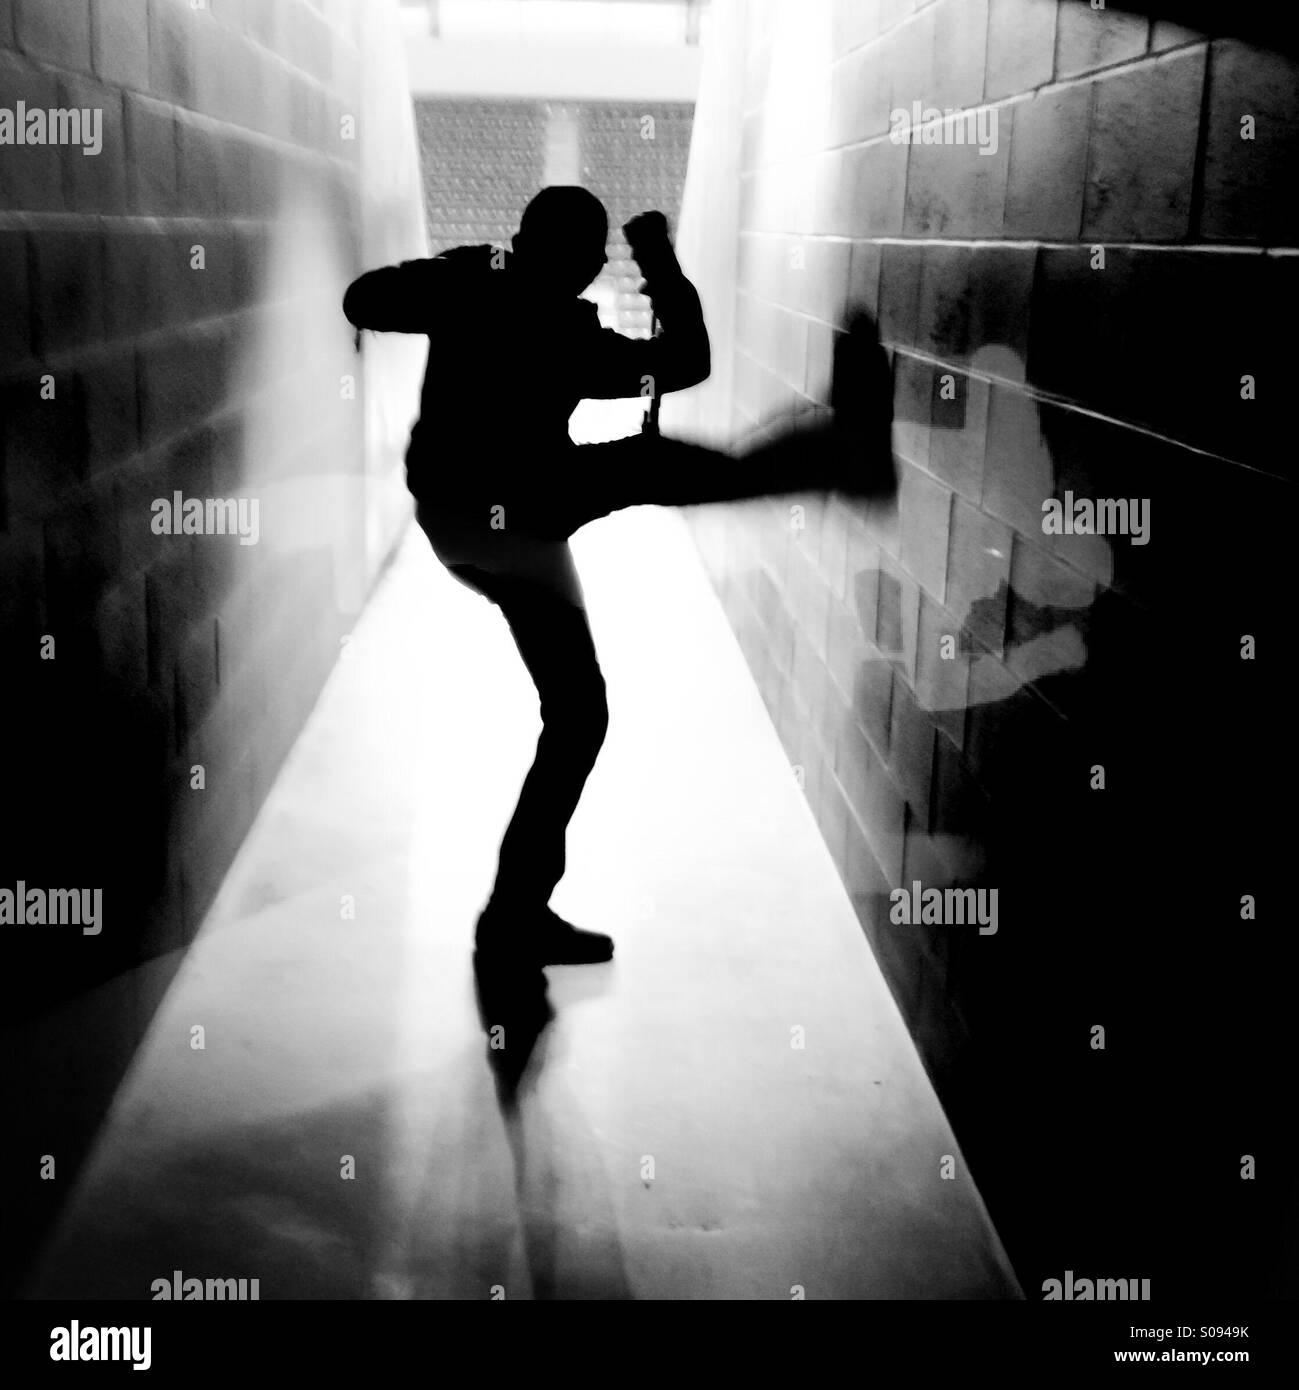 Silhouette of teen boy kicking - Stock Image